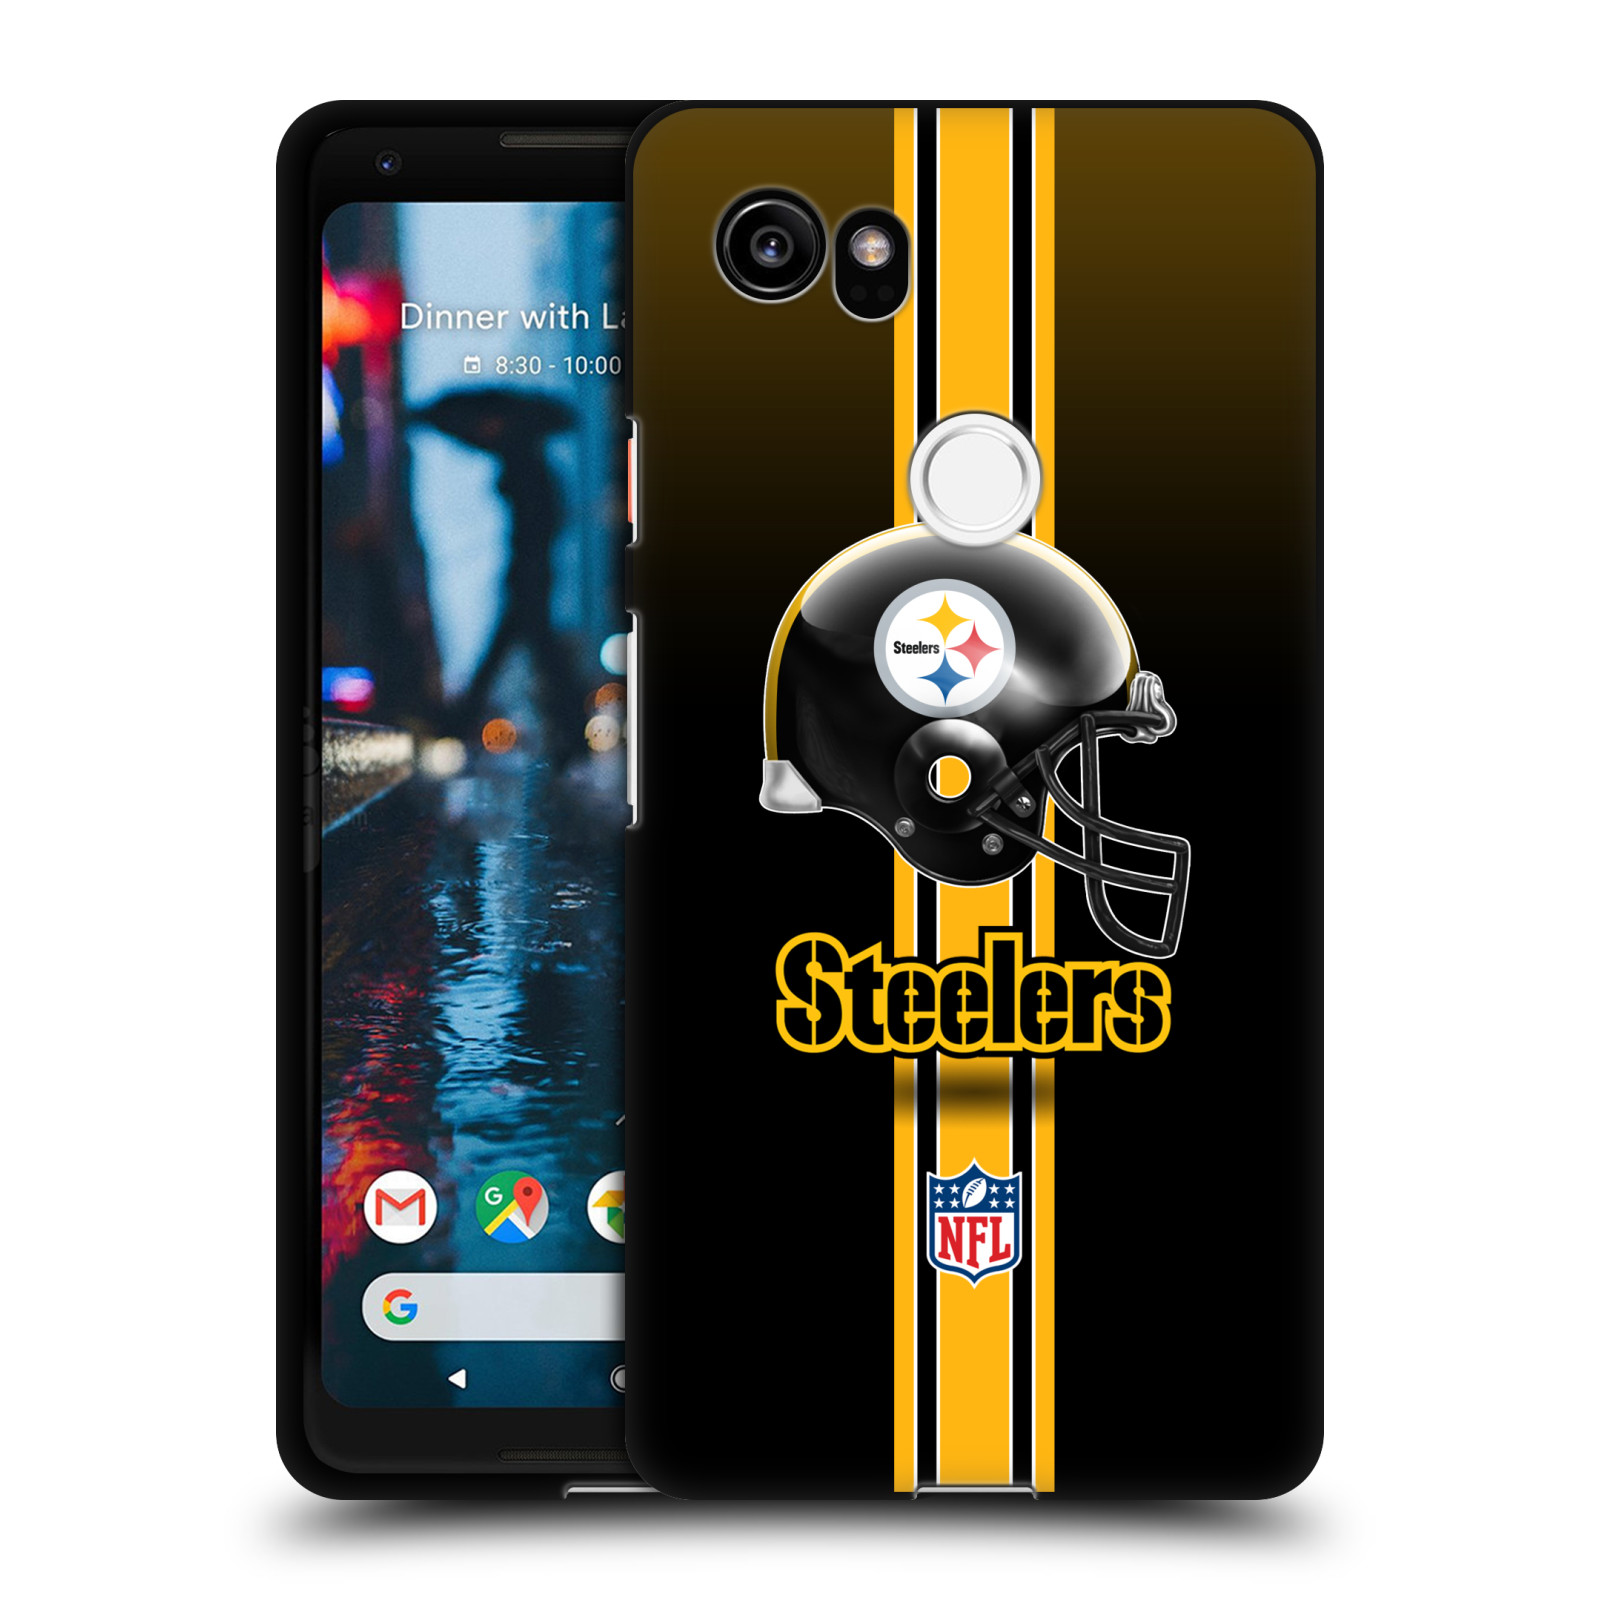 OFFICIEL-NFL-PITTSBURGH-STEELERS-LOGO-COQUE-EN-GEL-NOIR-POUR-GOOGLE-TELEPHONES